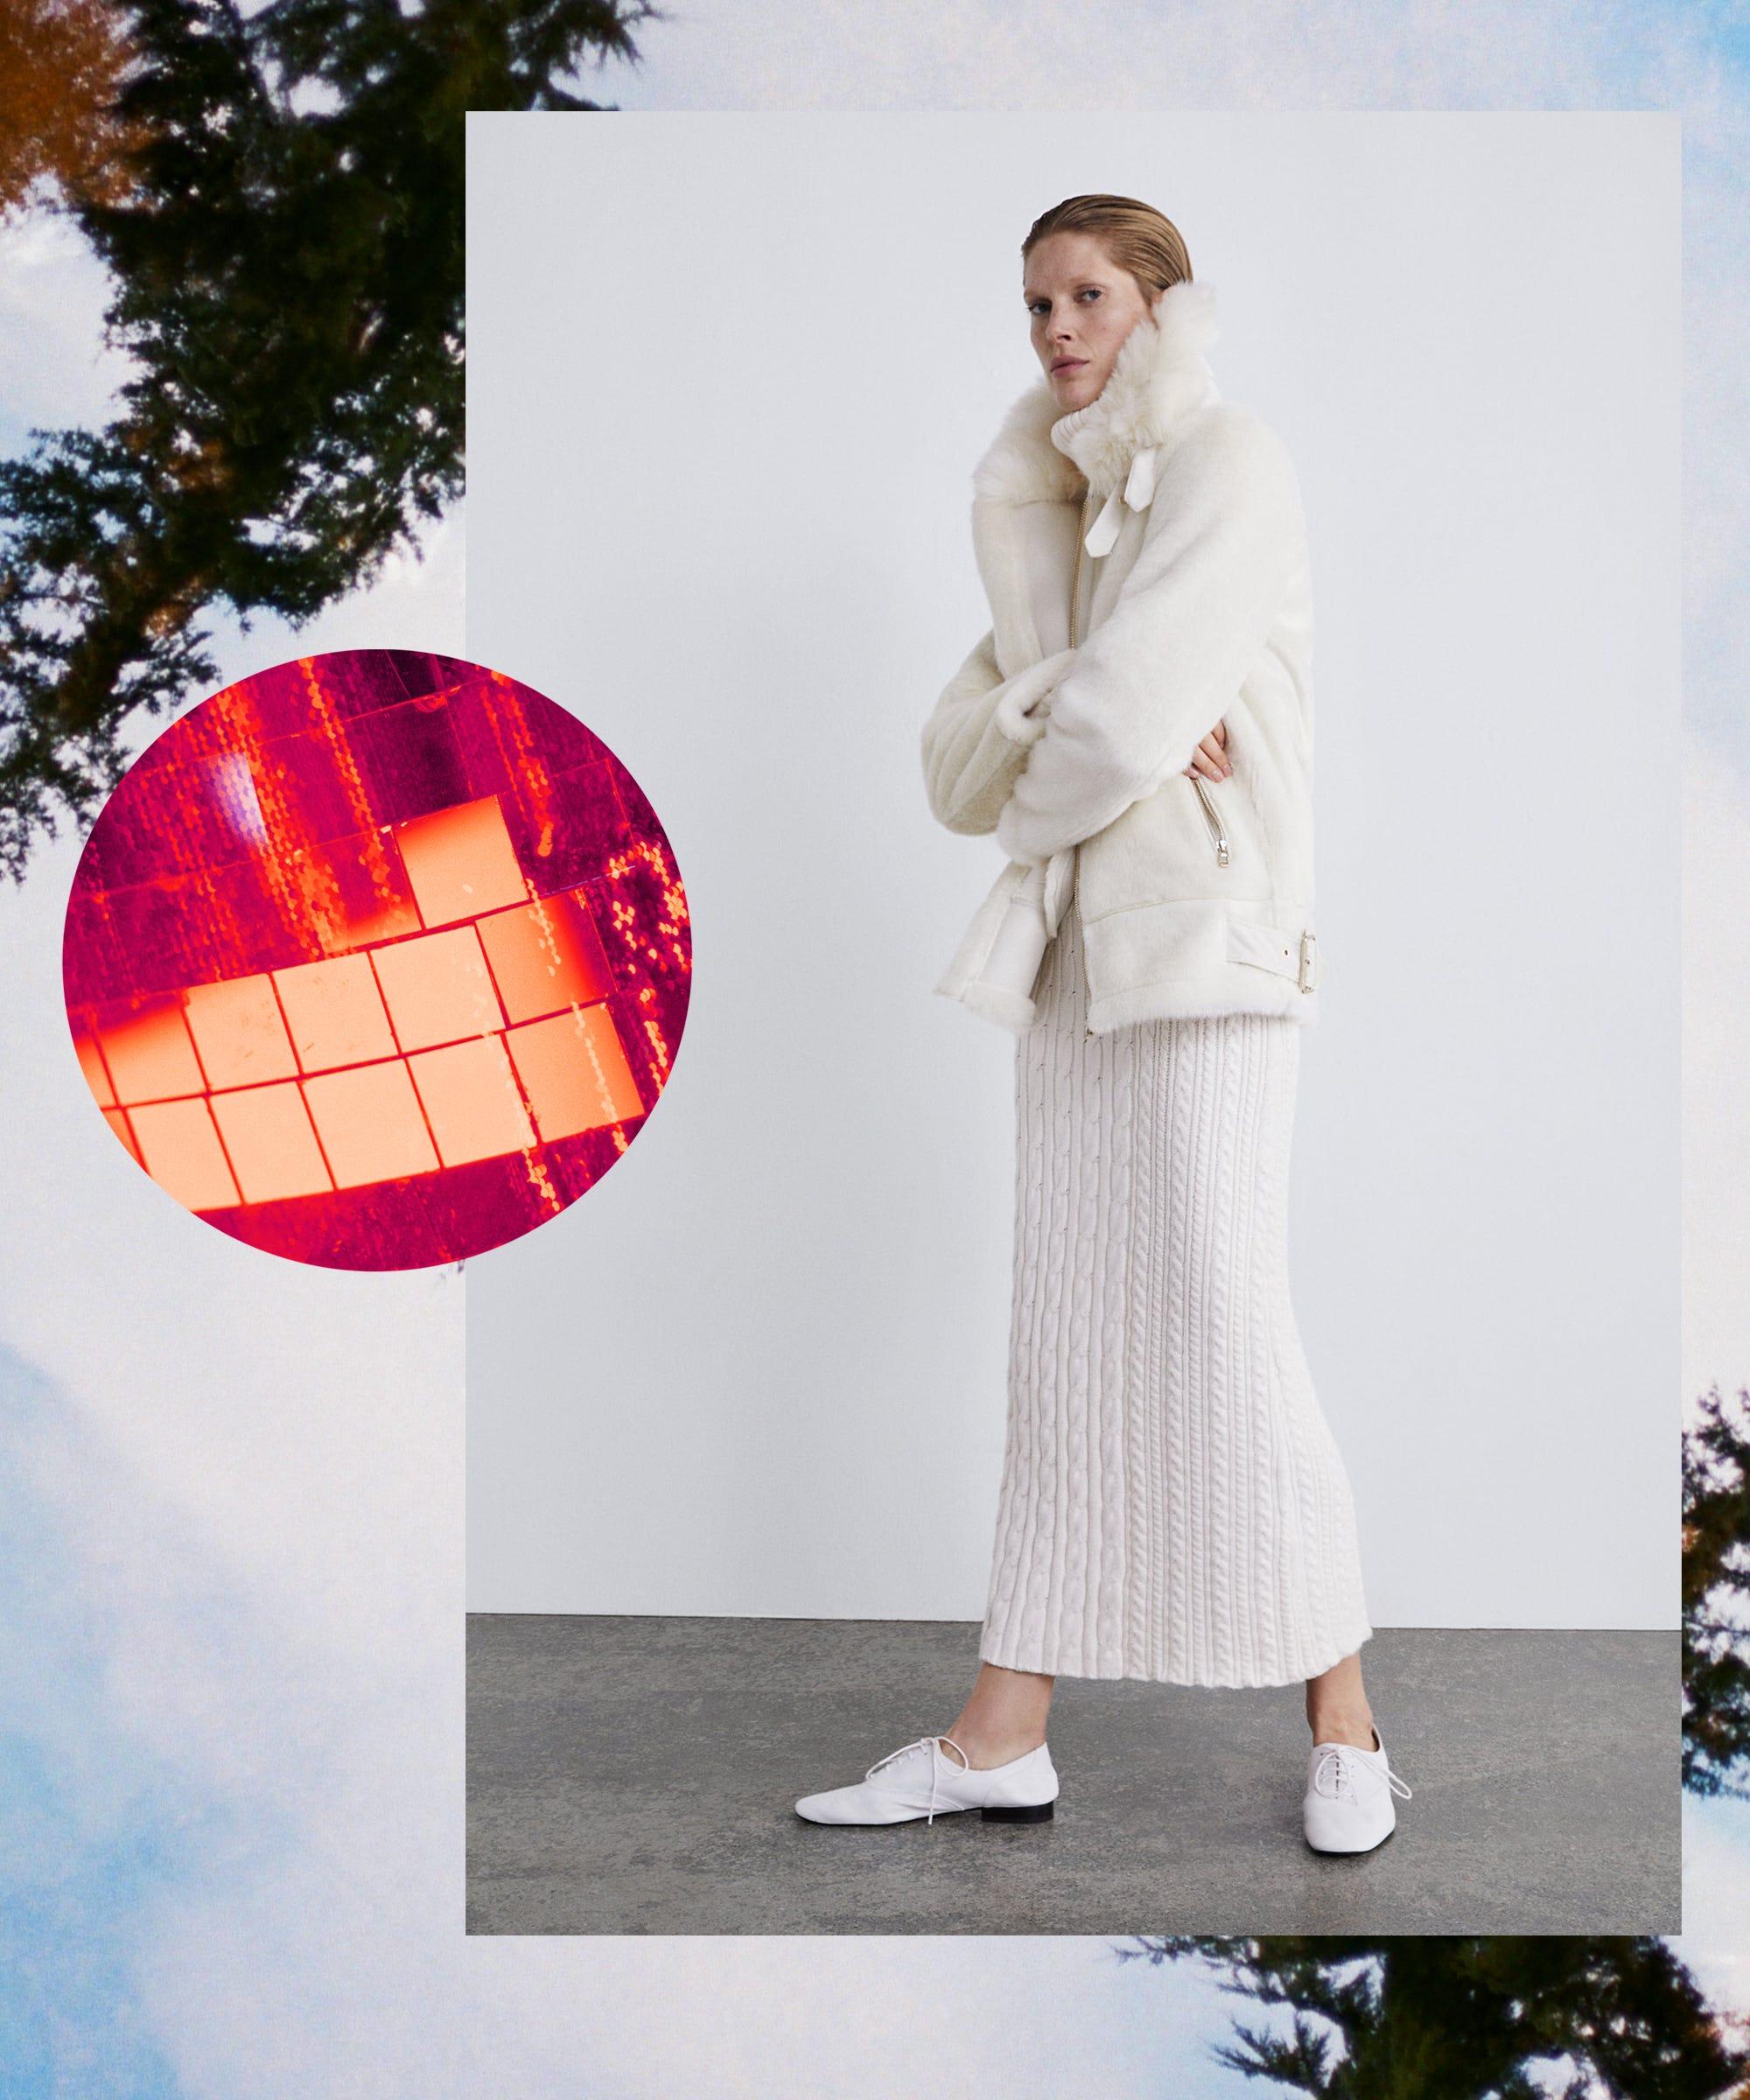 Fashion Inspirationtv recap leverage and perception, Names id stylish for facebook